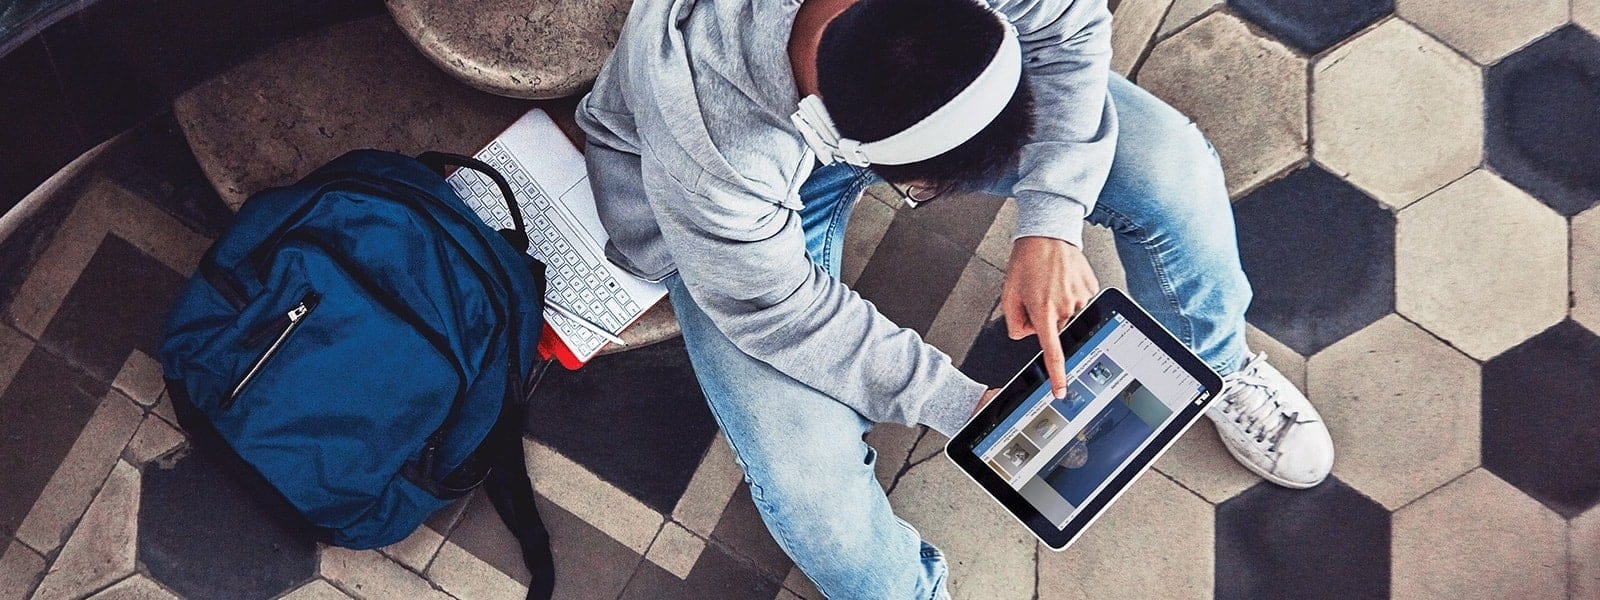 Schüler mit Windows10-Gerät